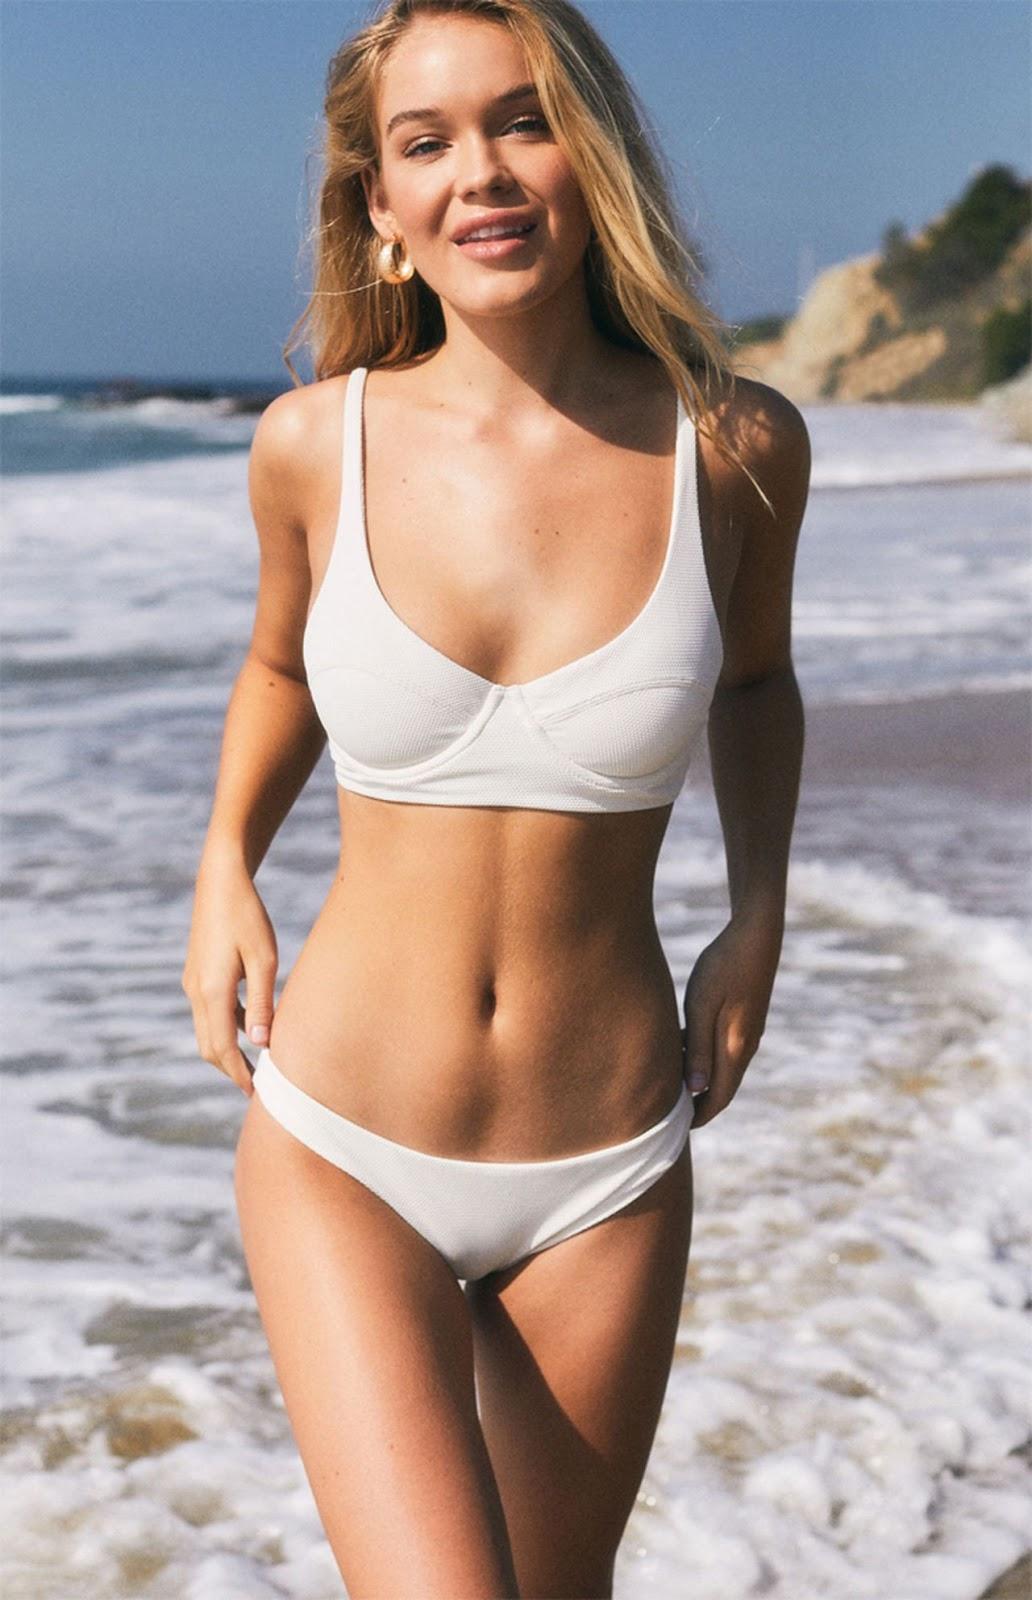 Faith Schroder in Bikini – Modeling Swimsuits January 2019